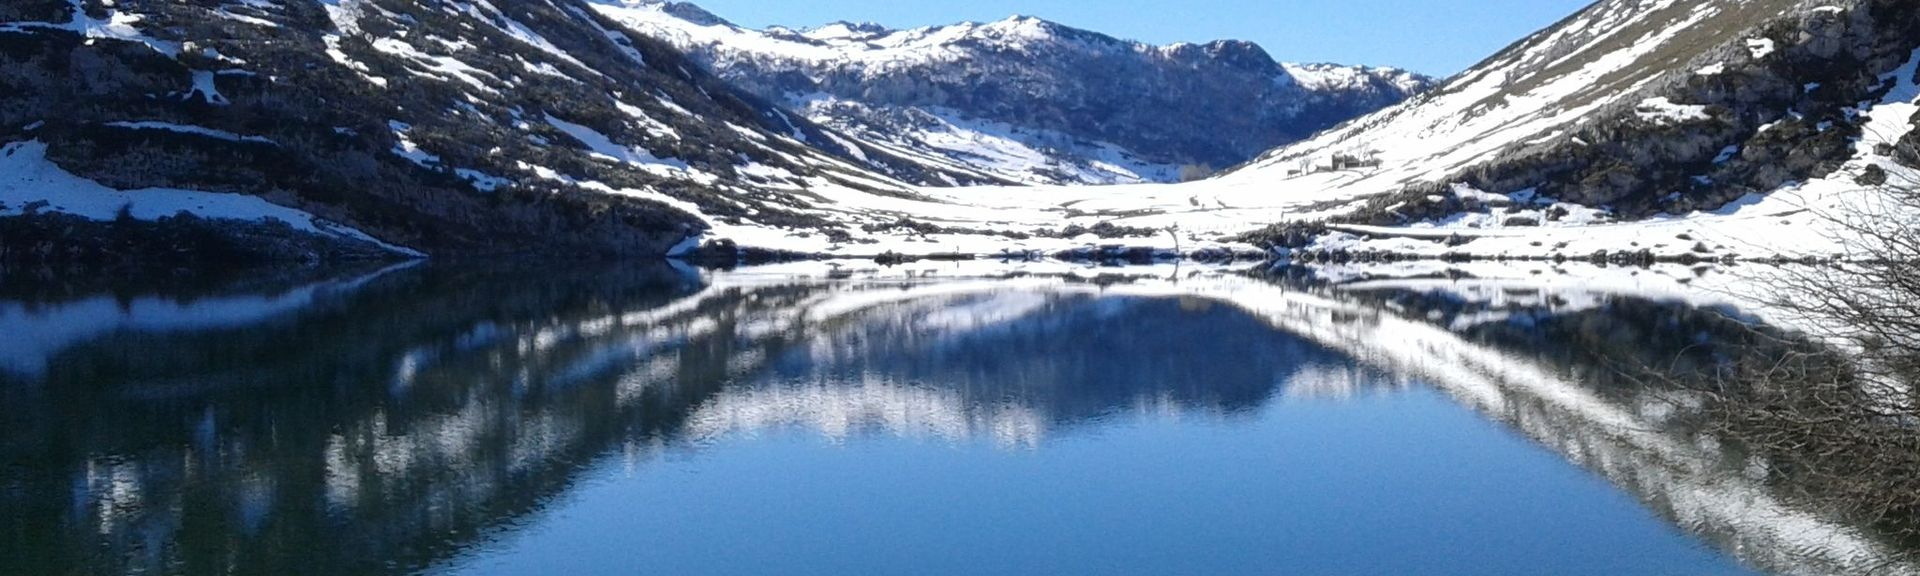 Fuentes, Asturias, Spain